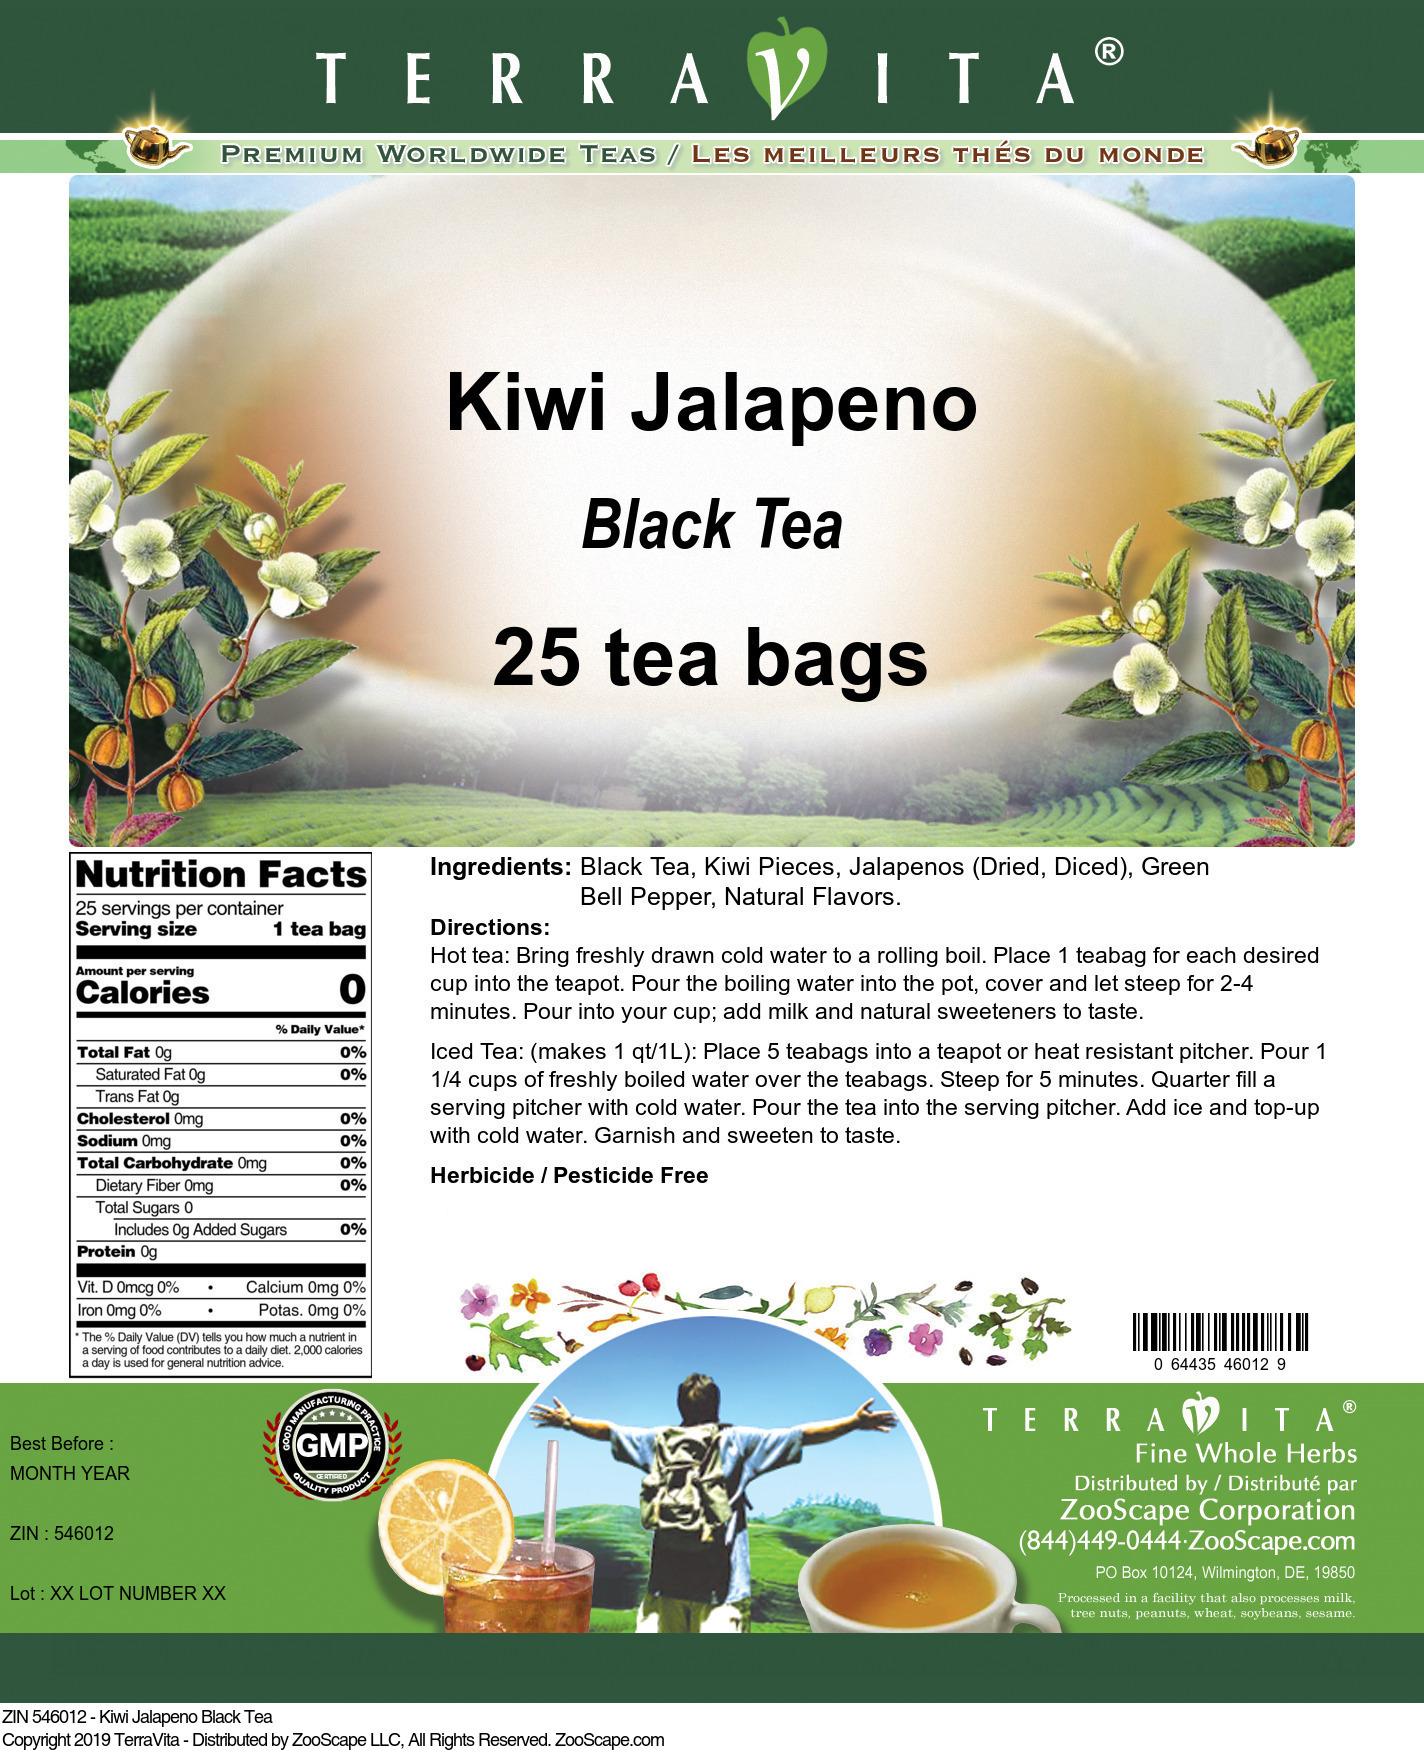 Kiwi Jalapeno Black Tea